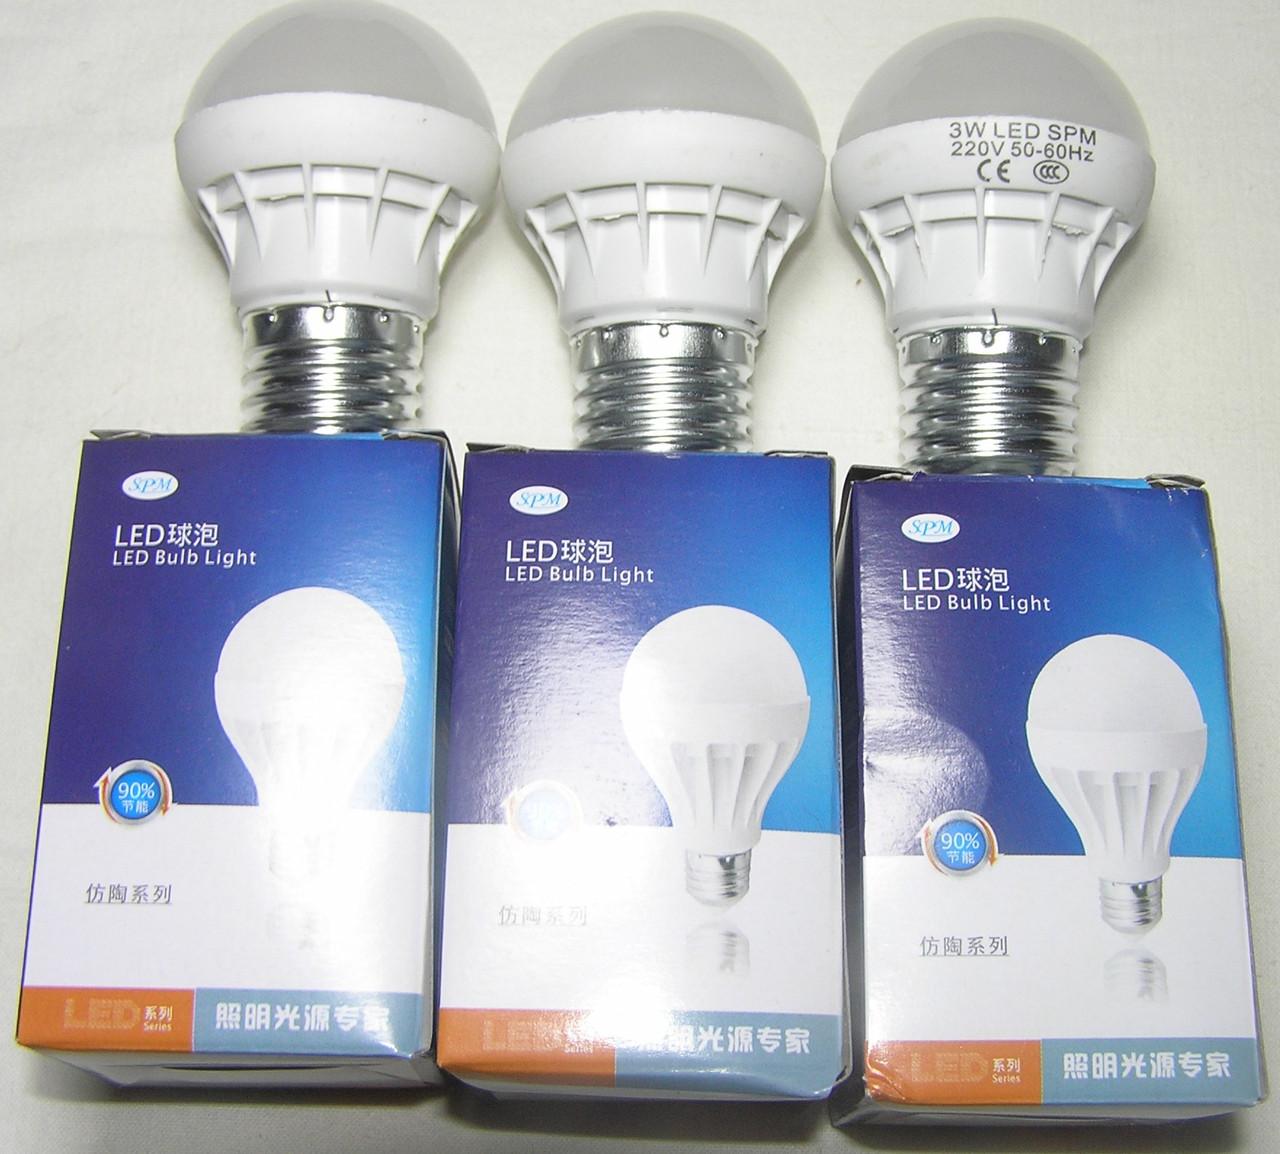 Лампа Daylight E27 3 Wt 5 led холодный